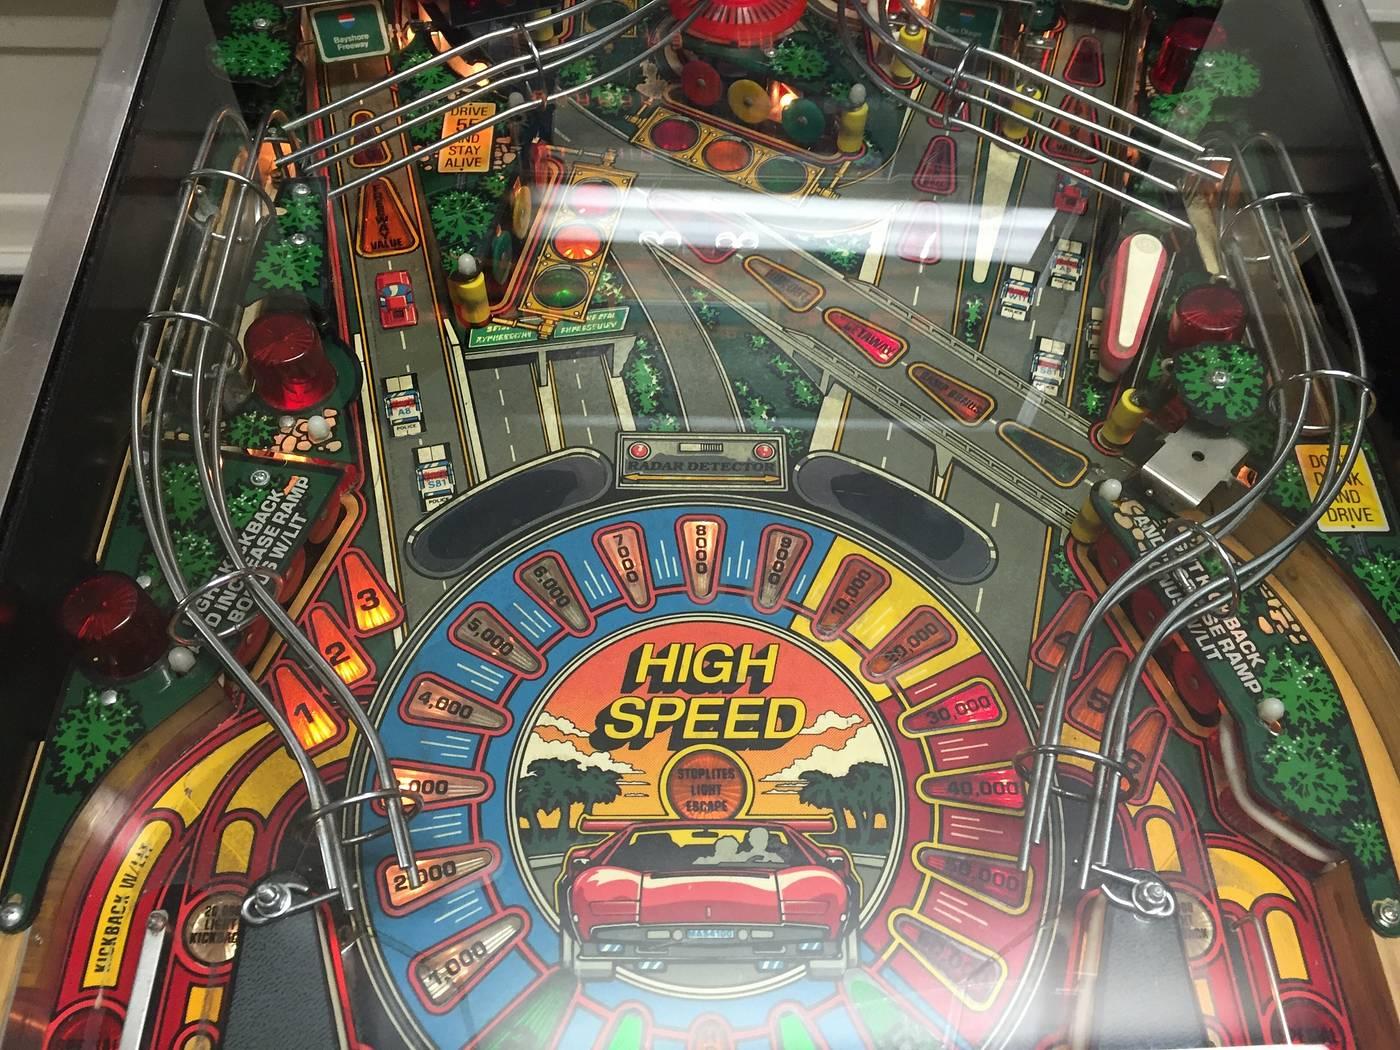 high speed pinball machine for sale